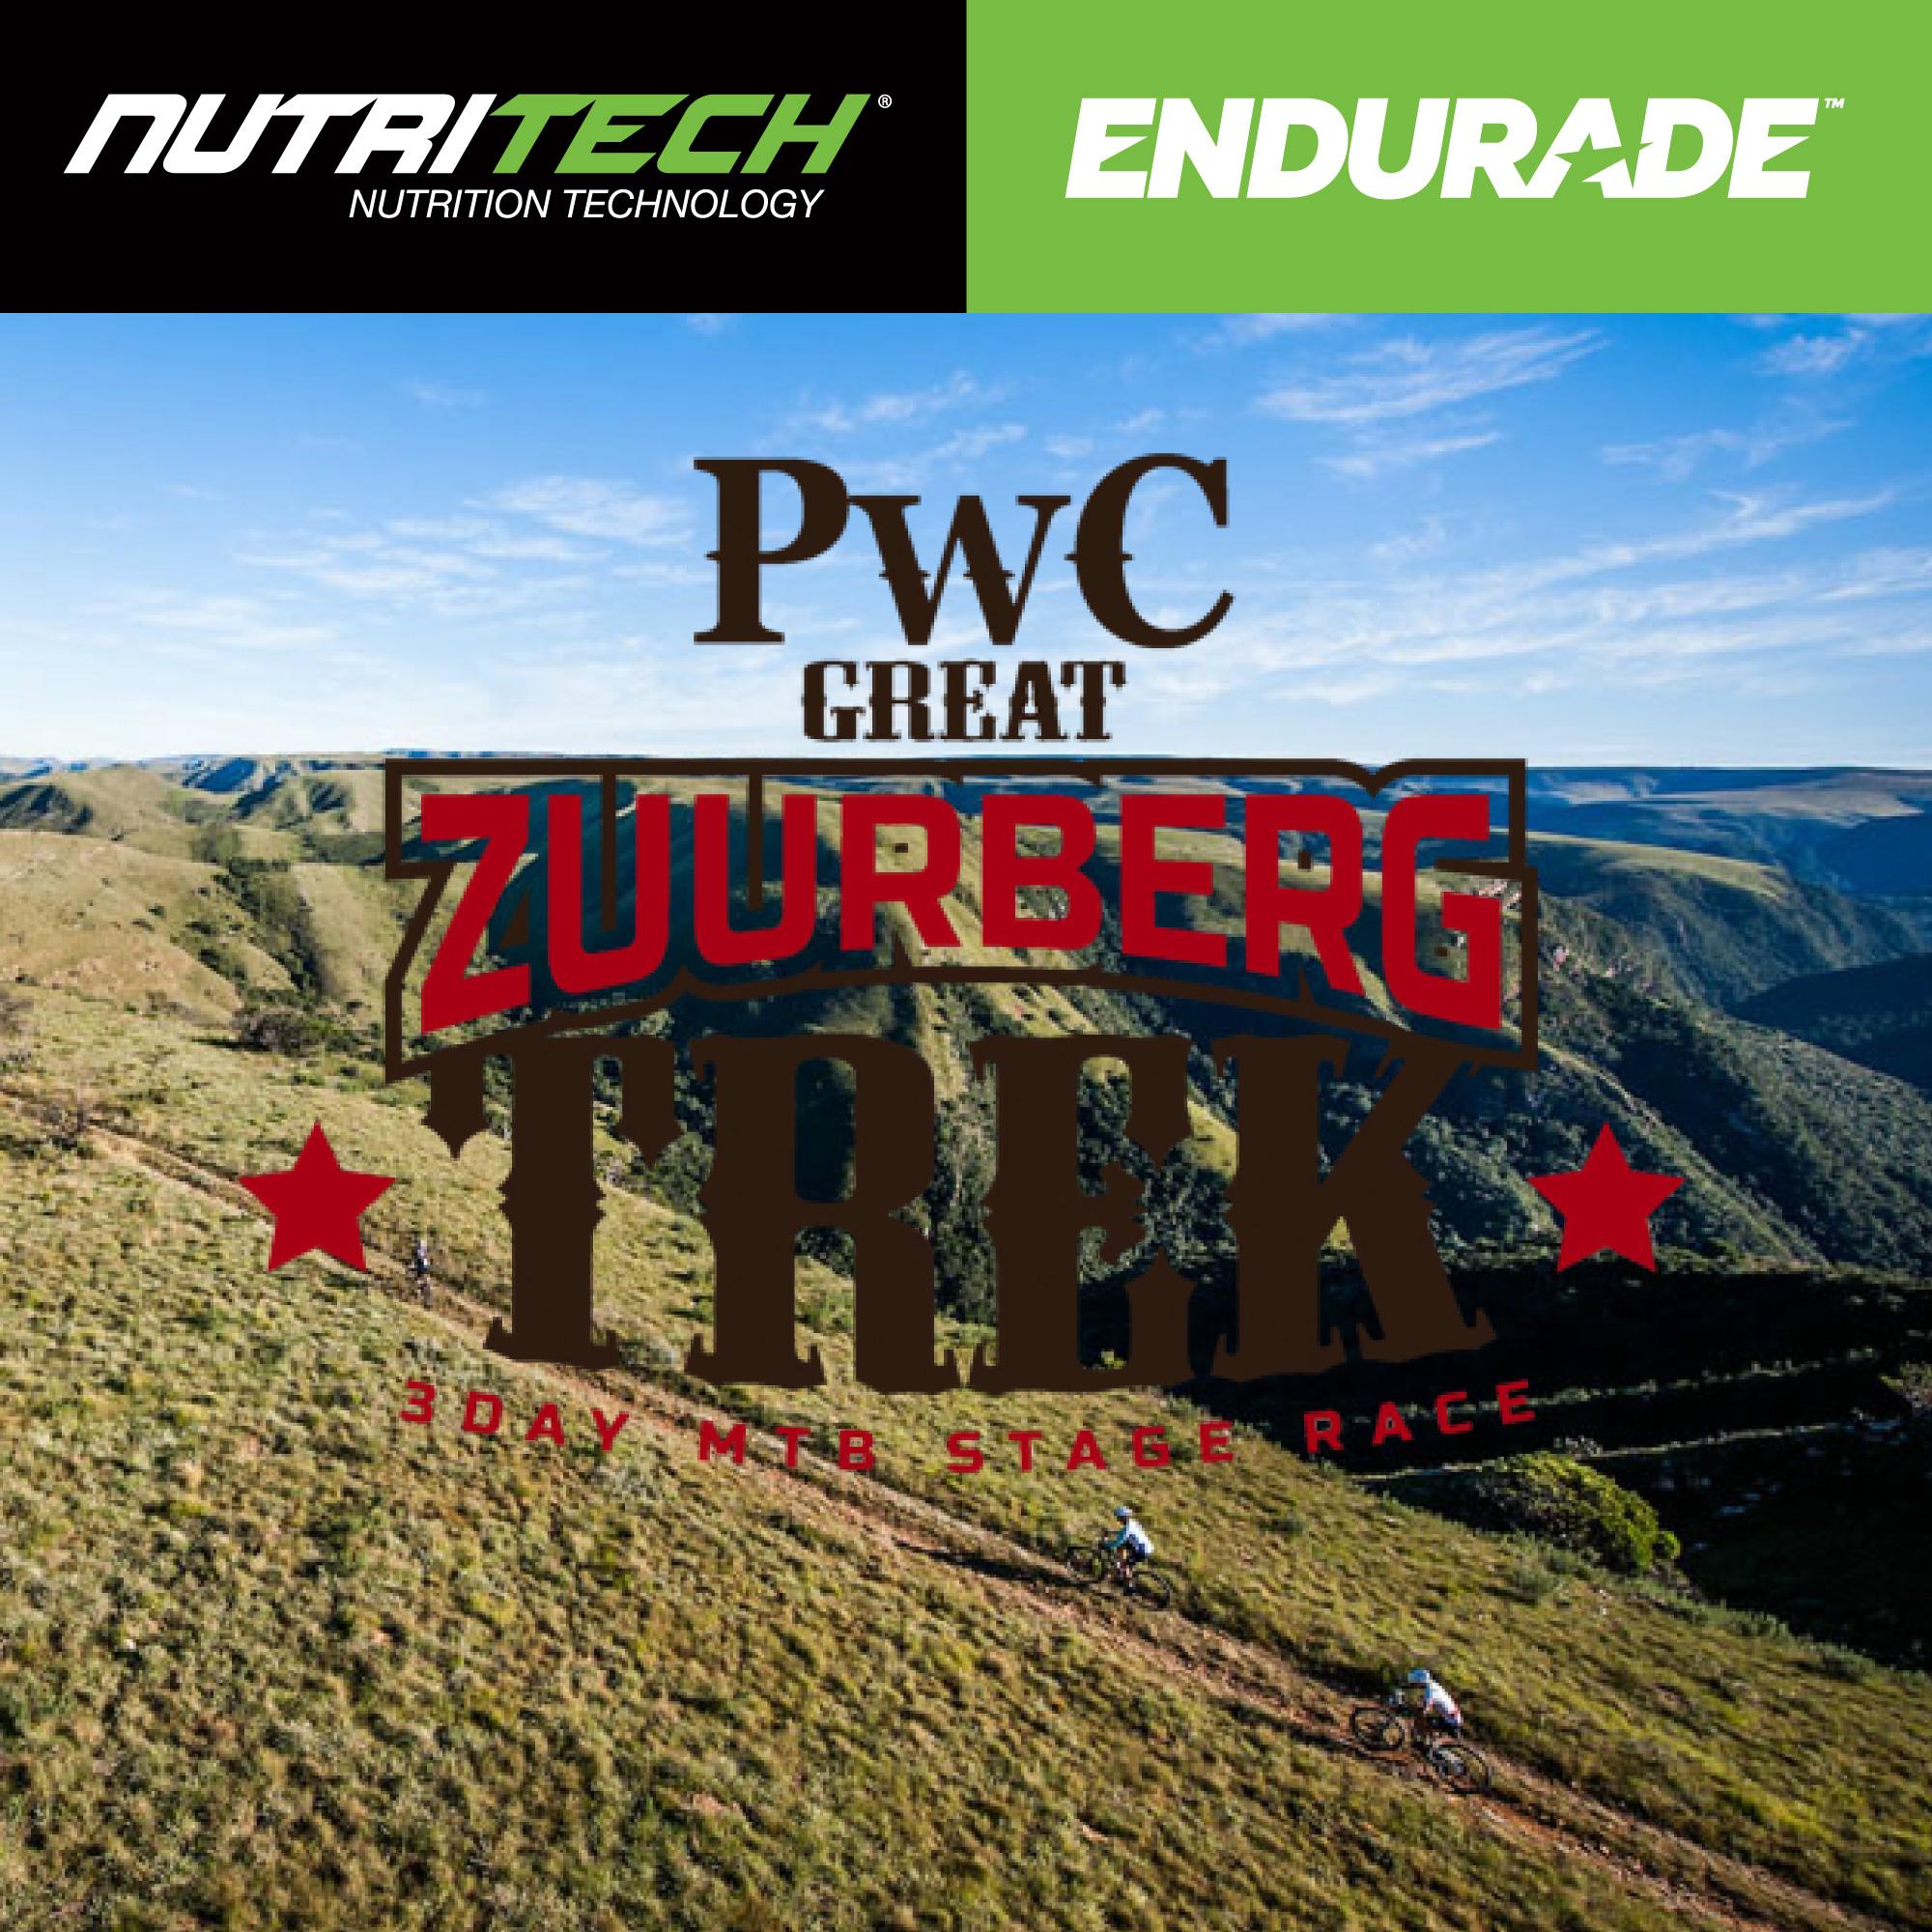 Great-Zuurberg-Trek